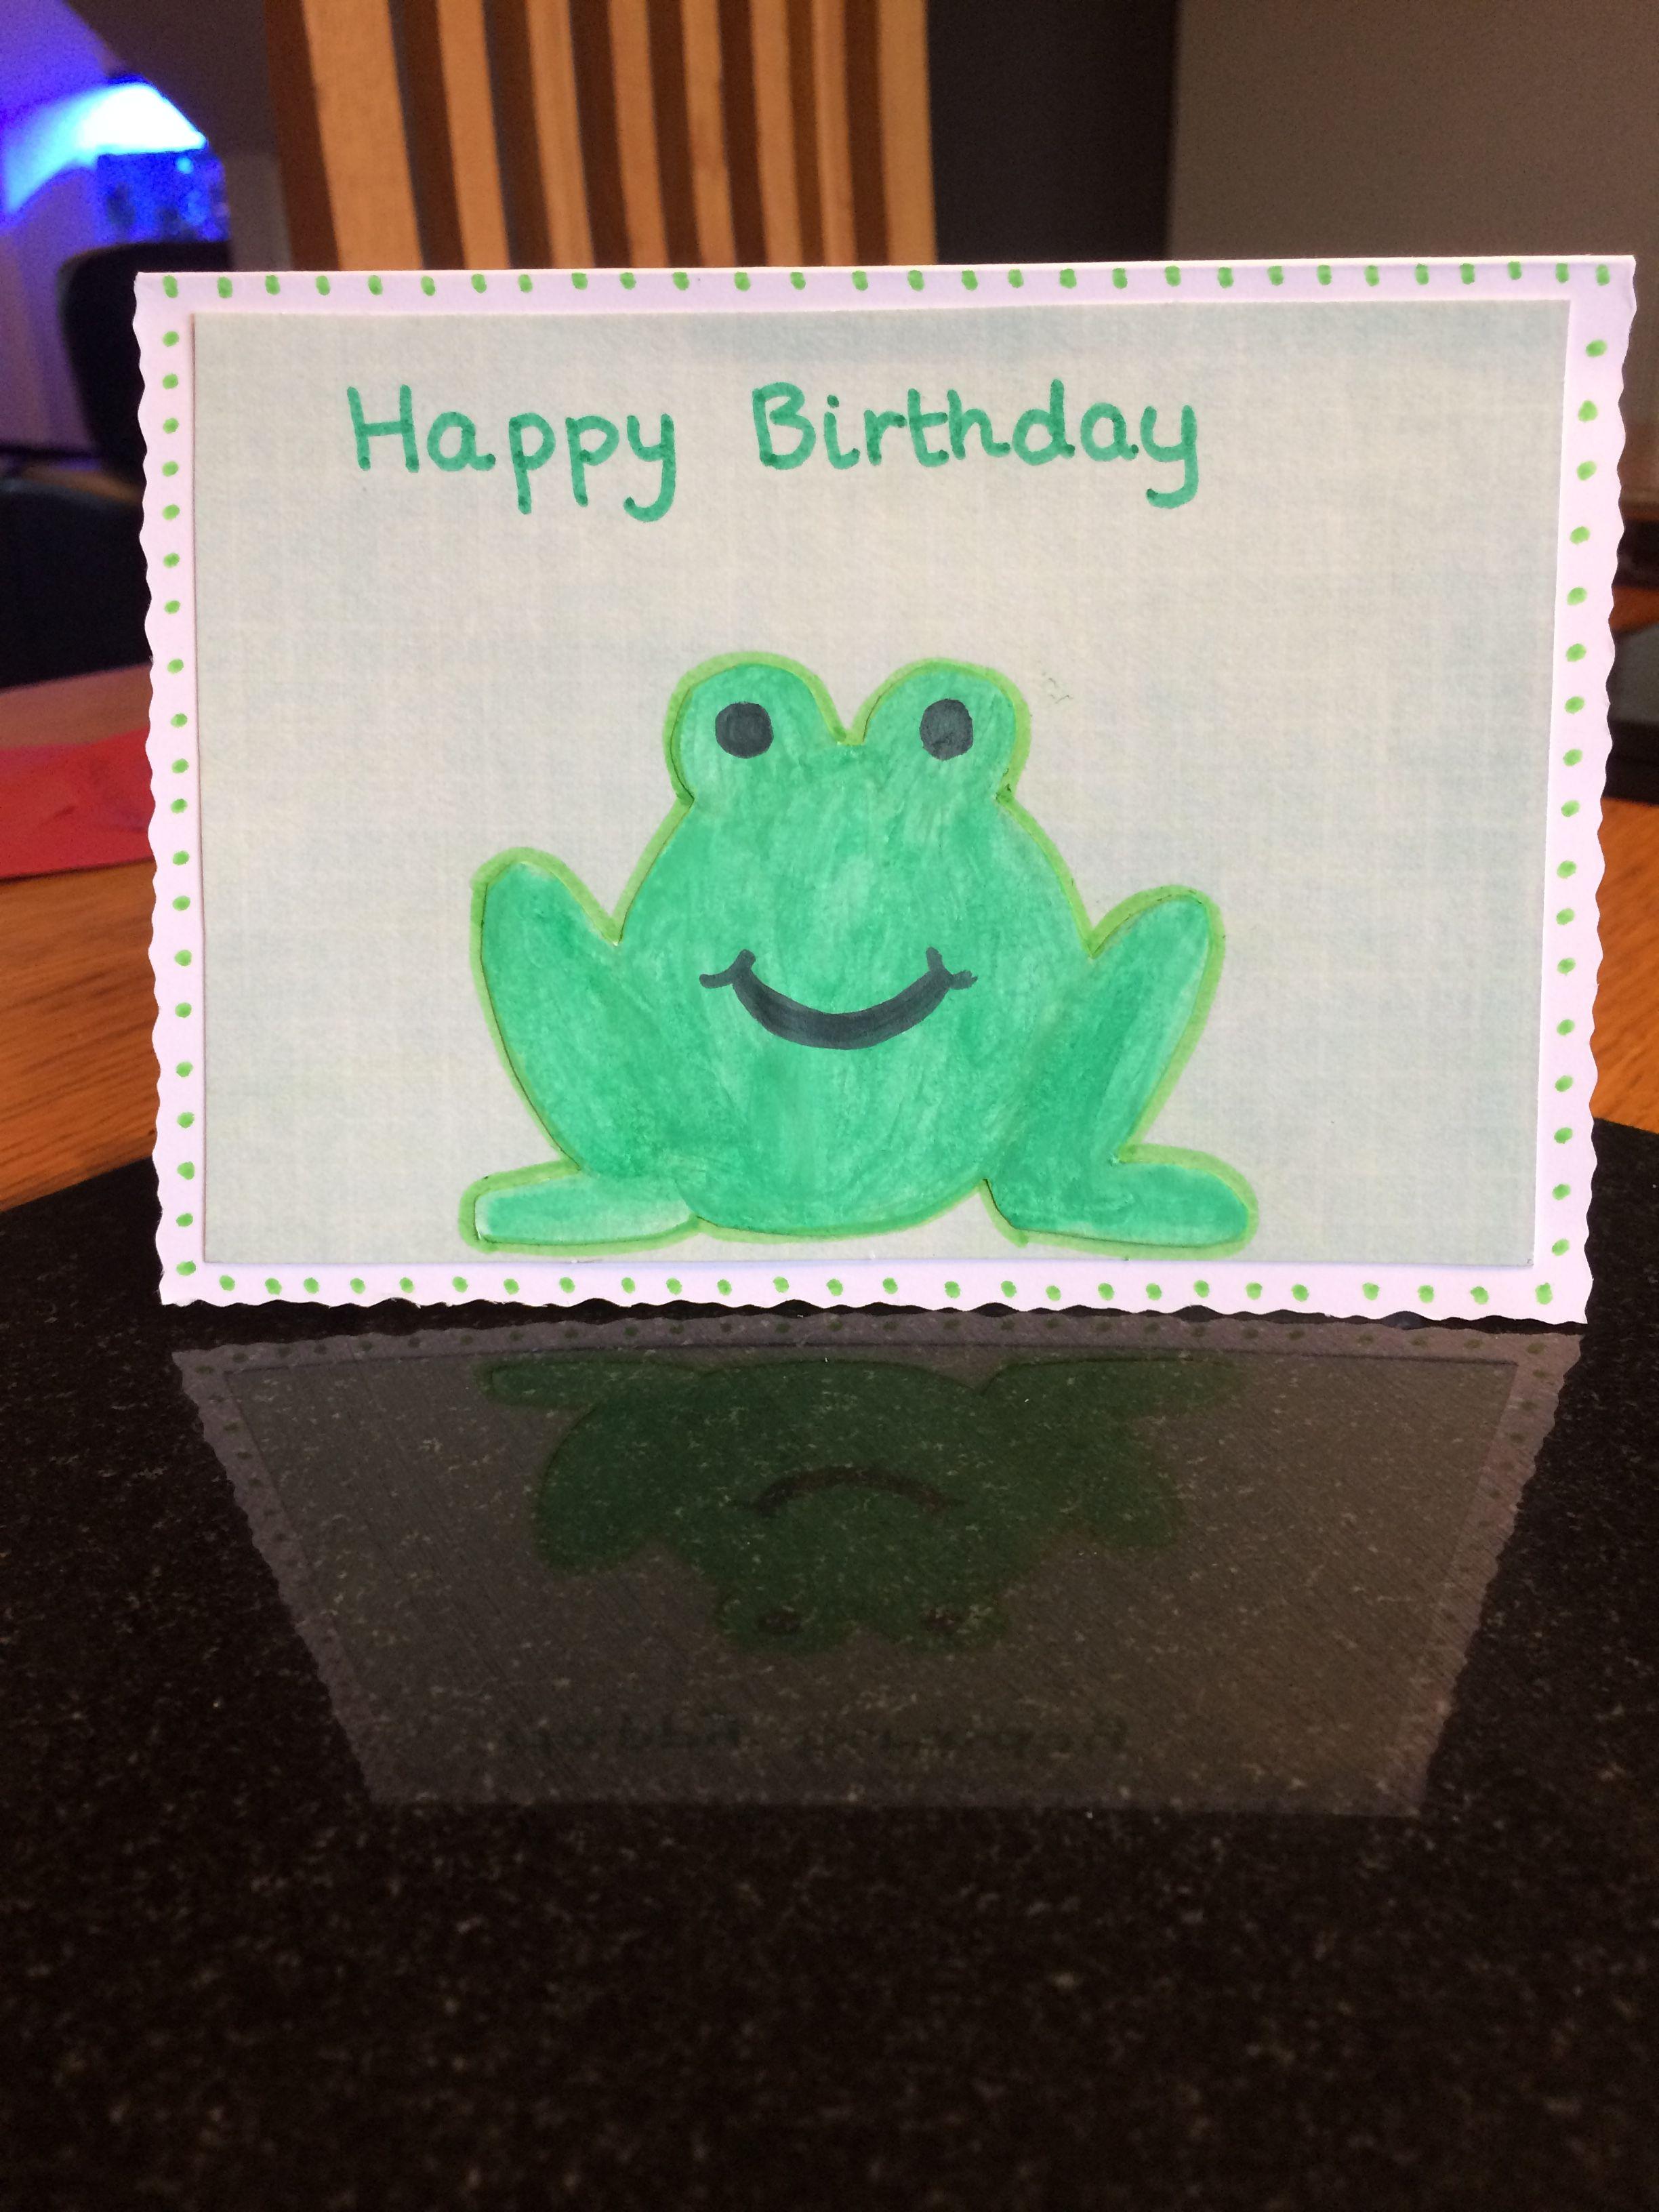 Frog 🐸 birthday card homemade Creative Craft